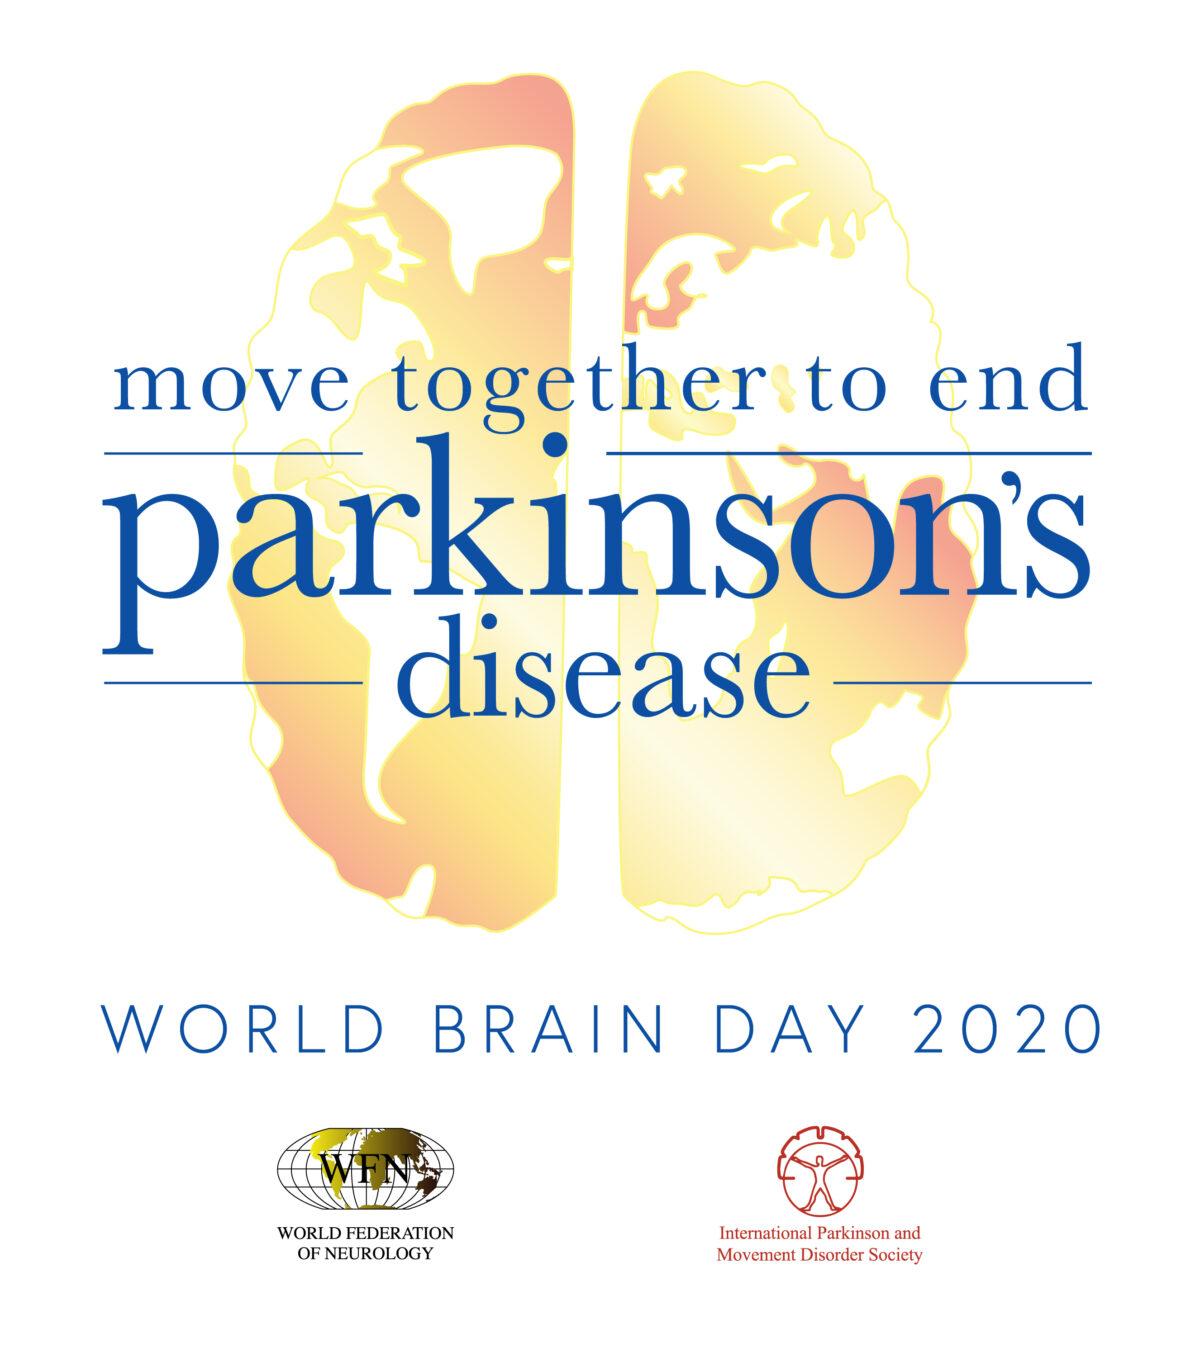 22 July 2020 | World Brain Day